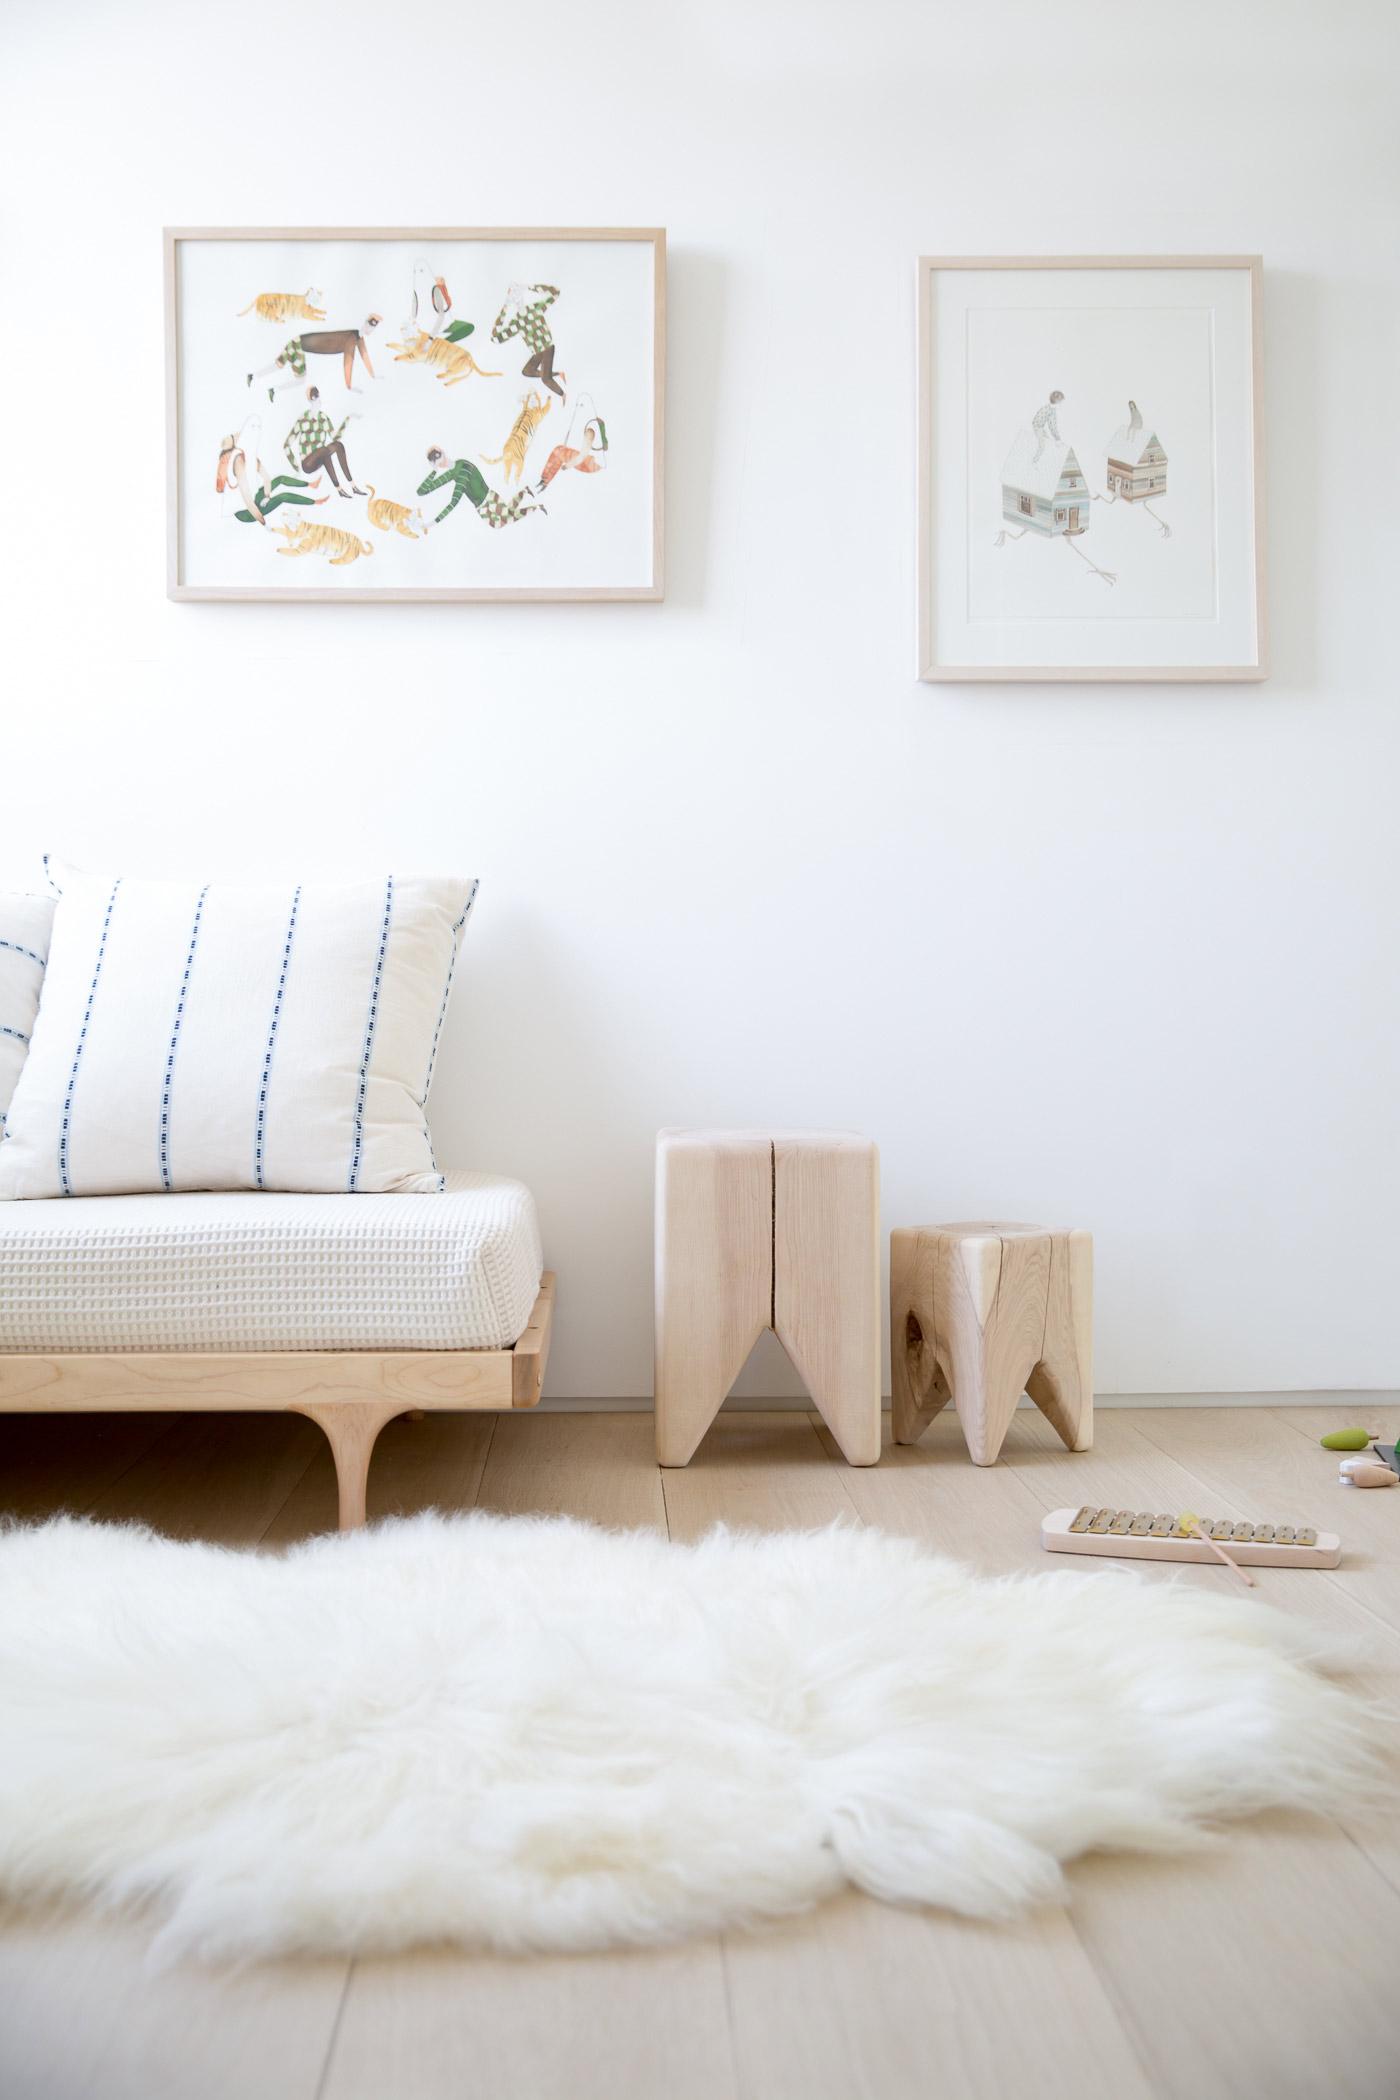 stump  modern raw wood stool or side table  kalon studios us - stumps and caravan divan in the wild